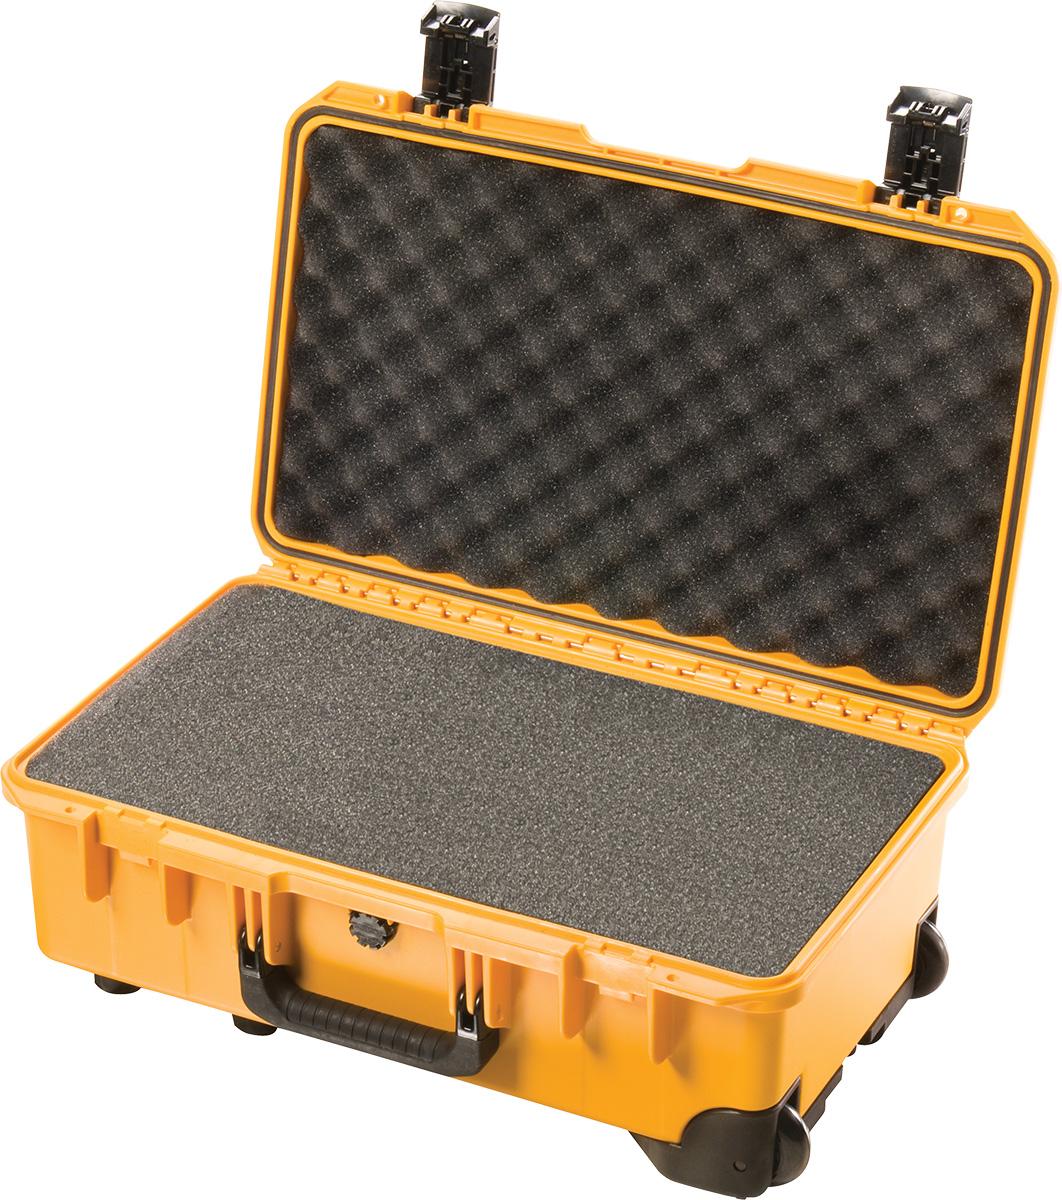 pelican im2500 yellow storm rolling case